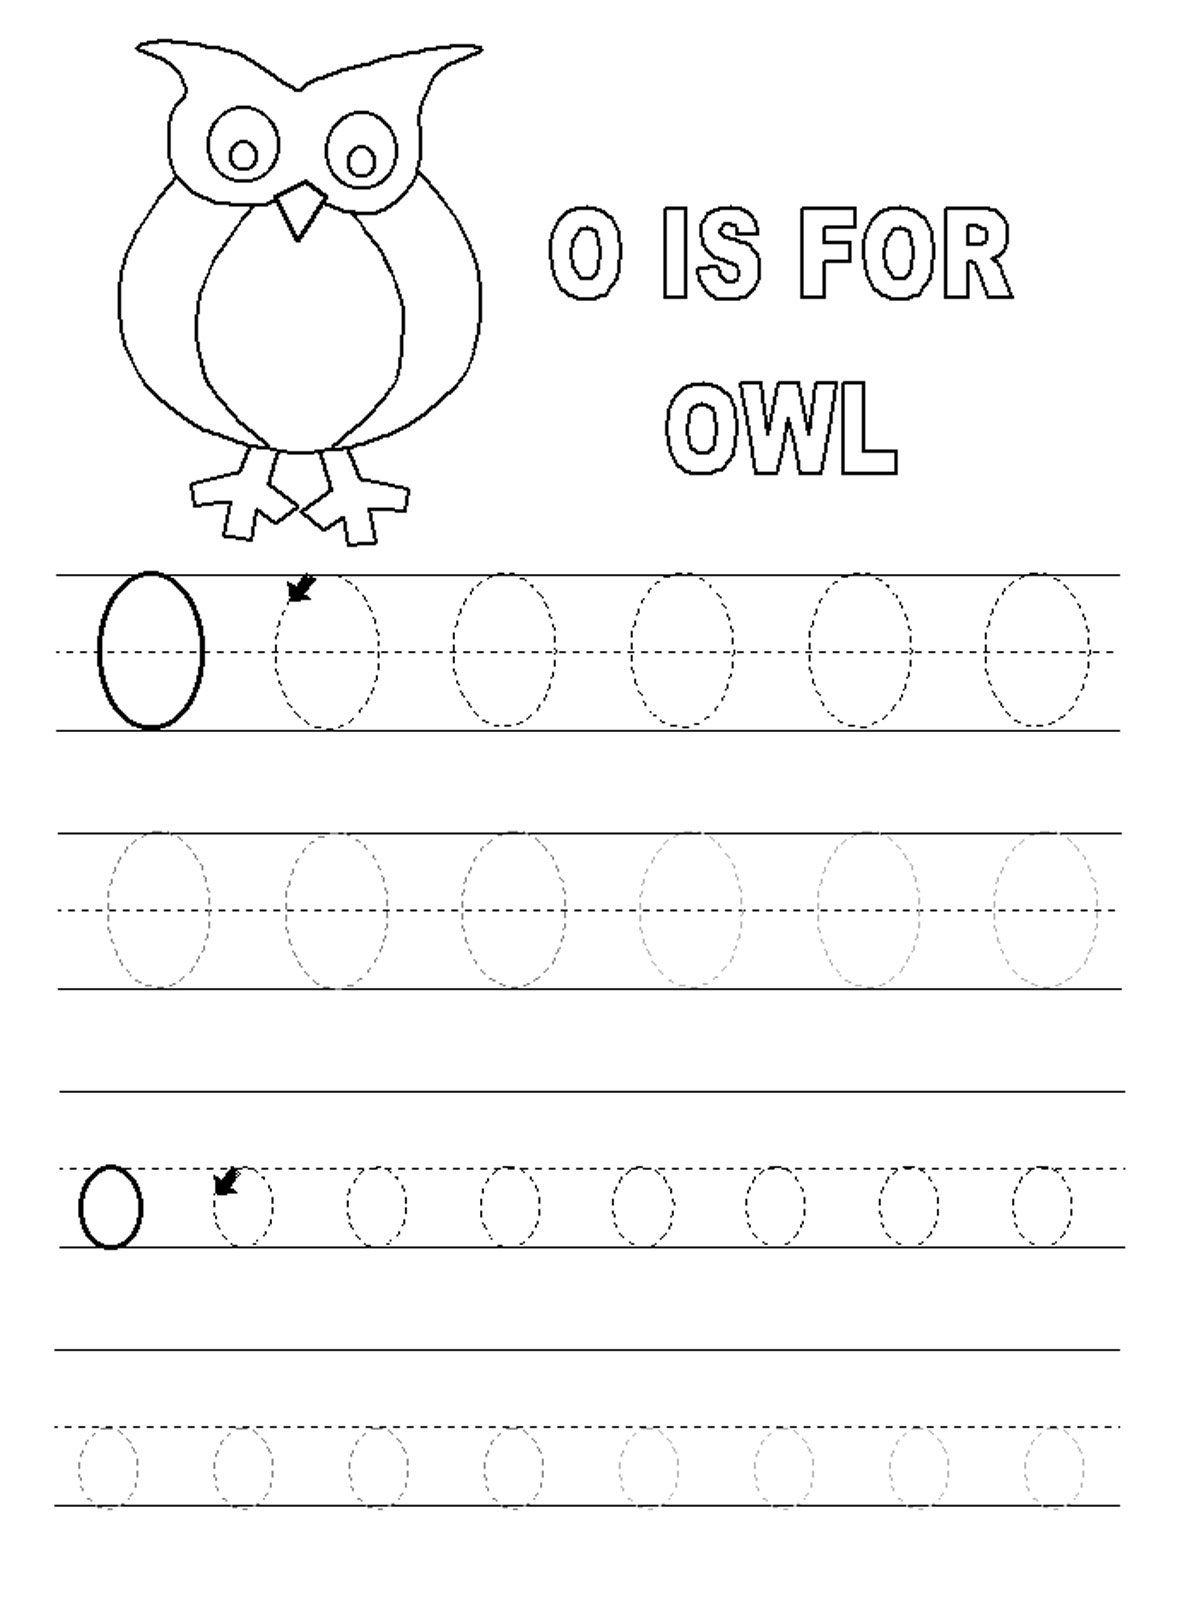 Letter O Worksheets For Preschool | Letter O Worksheets throughout Letter O Worksheets For Kindergarten